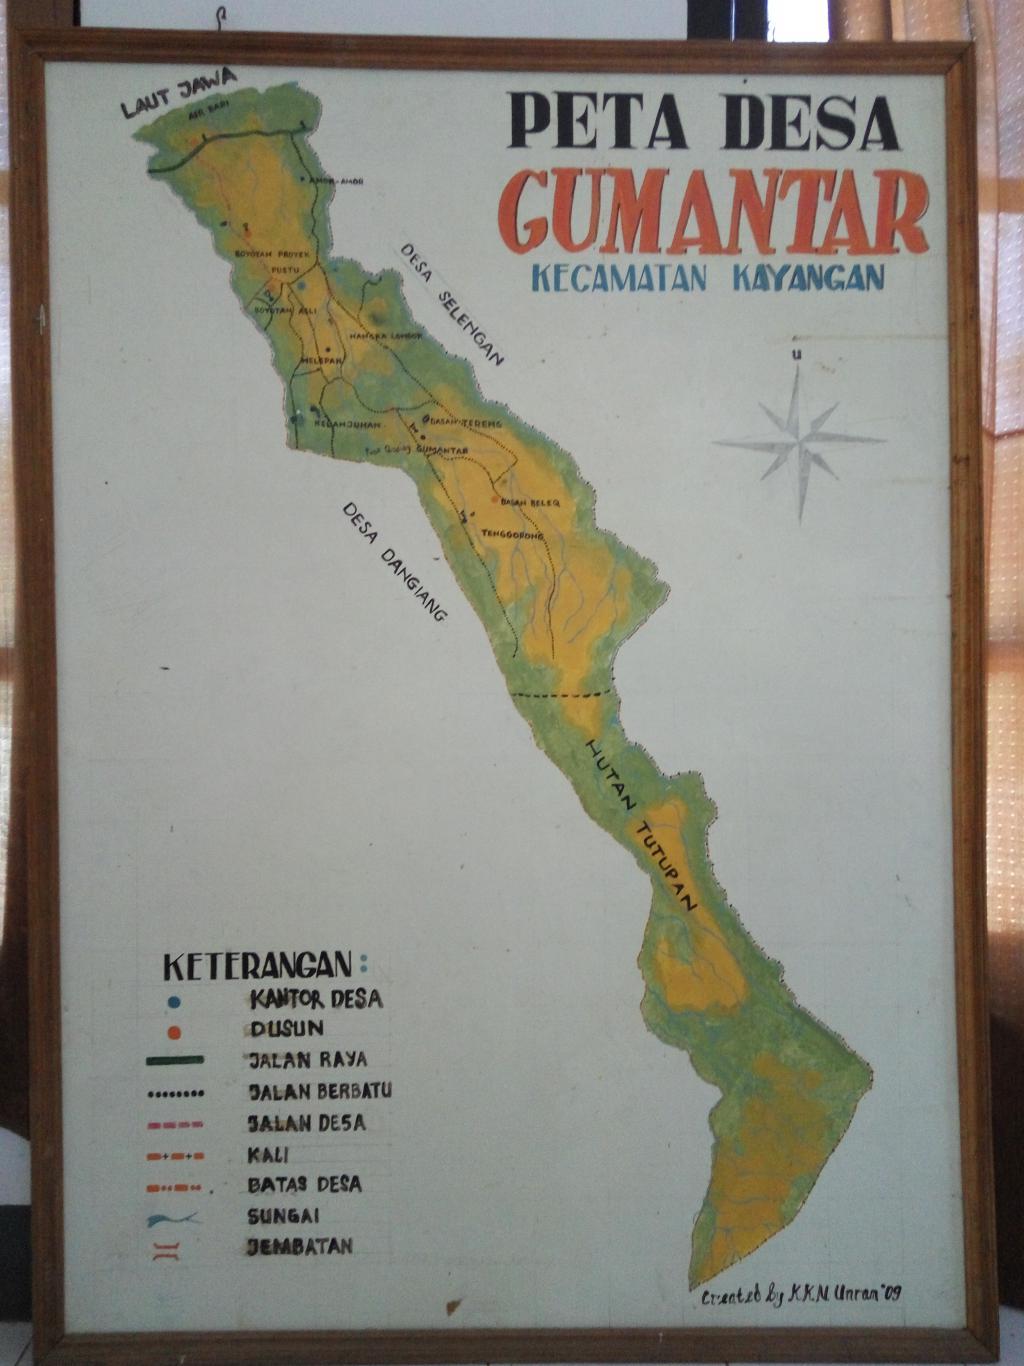 Sejarah Desa Website Gumantar Dokumen Lampiran Selayang Pandang Guamantar Kab